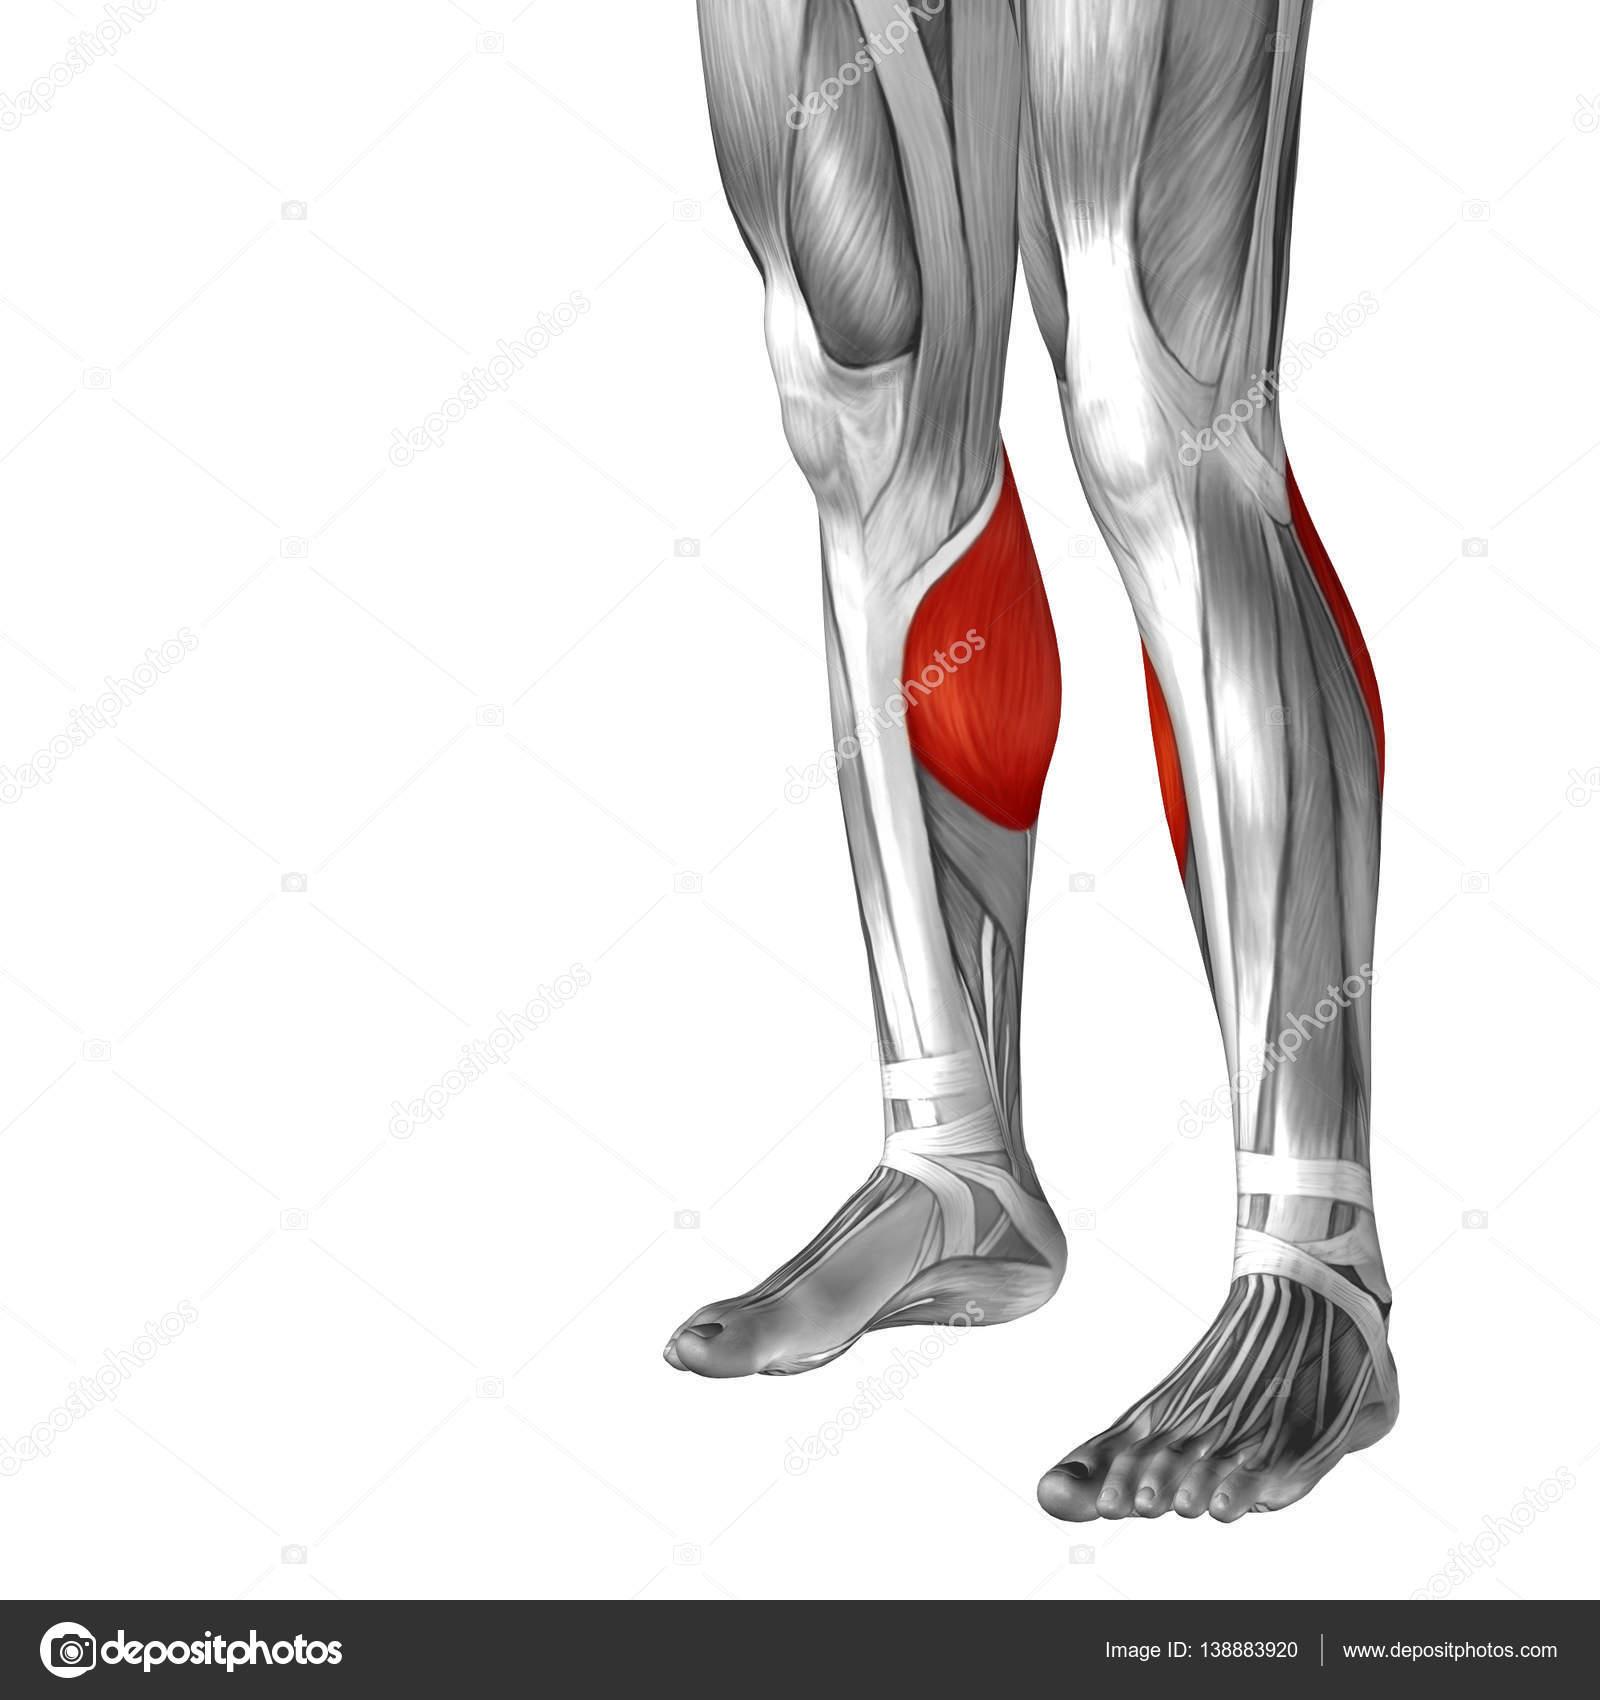 Human Lower Leg Anatomy Stock Photo Design36 138883920